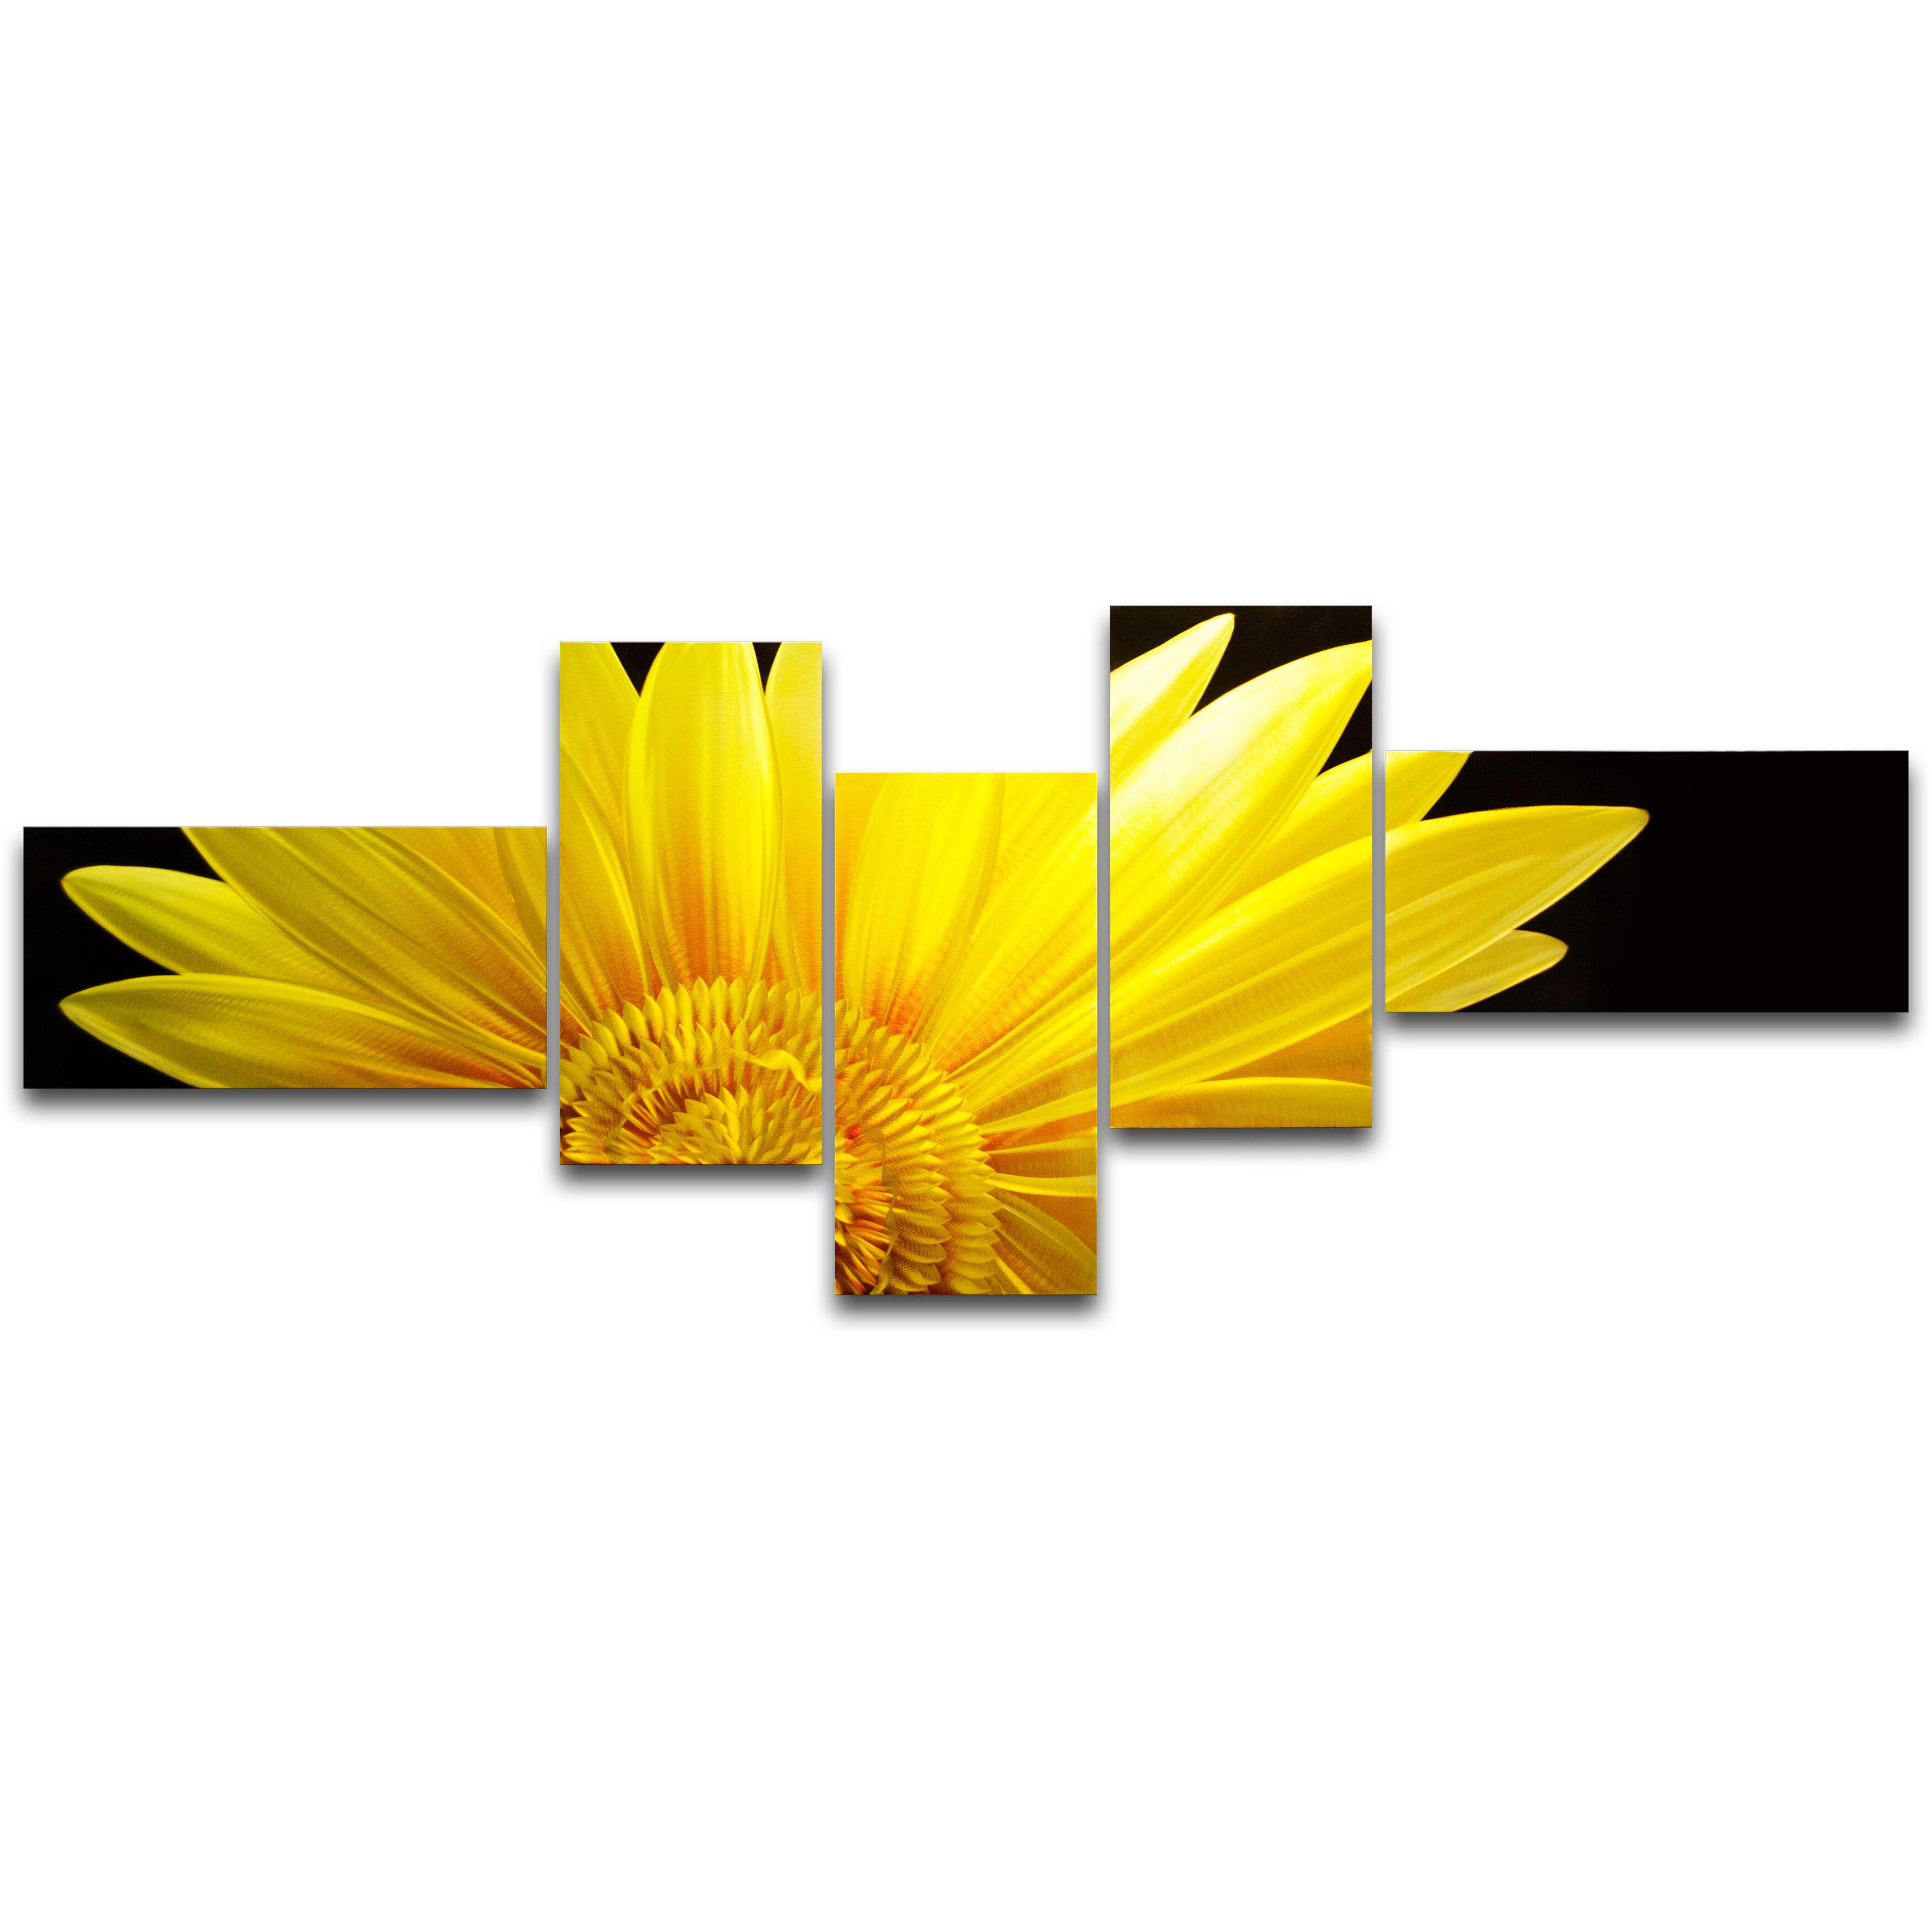 MetalArtscape The Sunflower 5 Piece Graphic Art Plaque Set | Wayfair